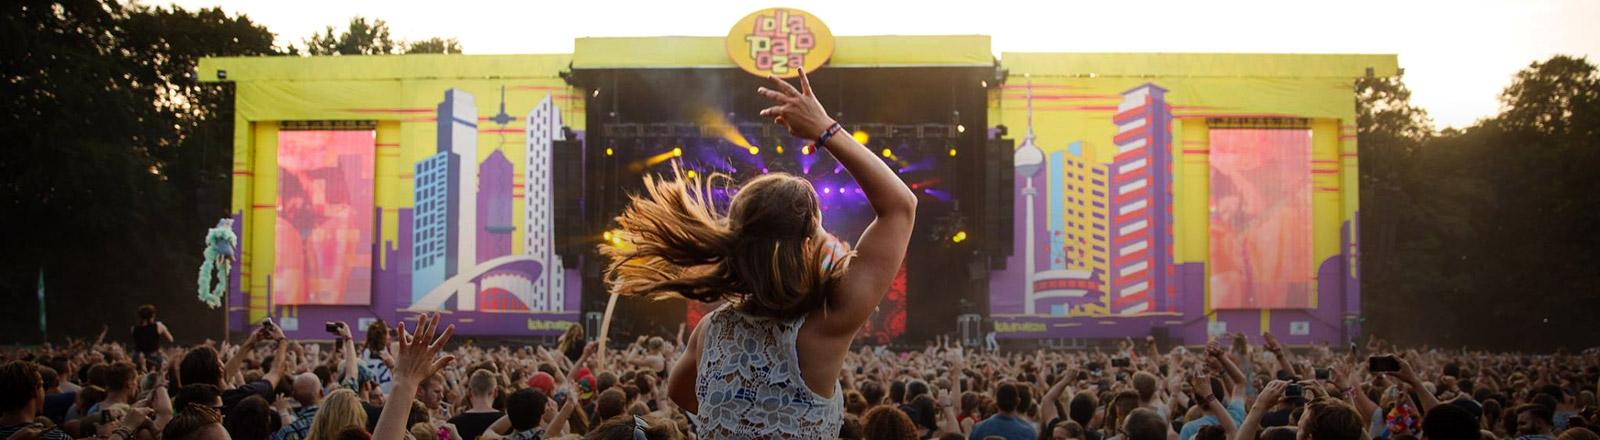 Eindruck vom Lollapalooza Festival